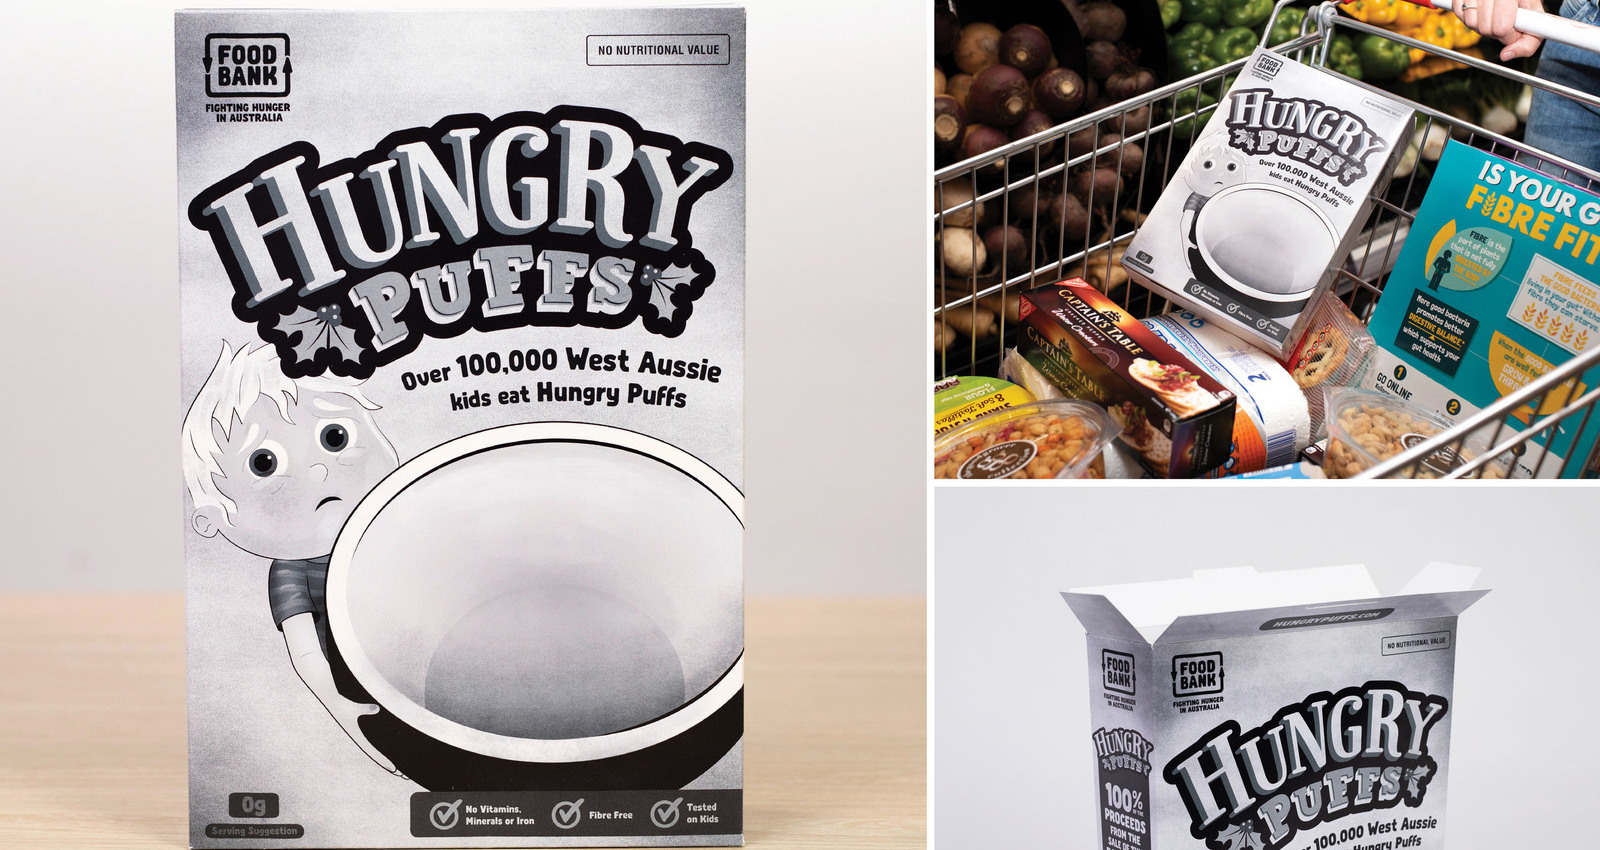 Hungry Puffs